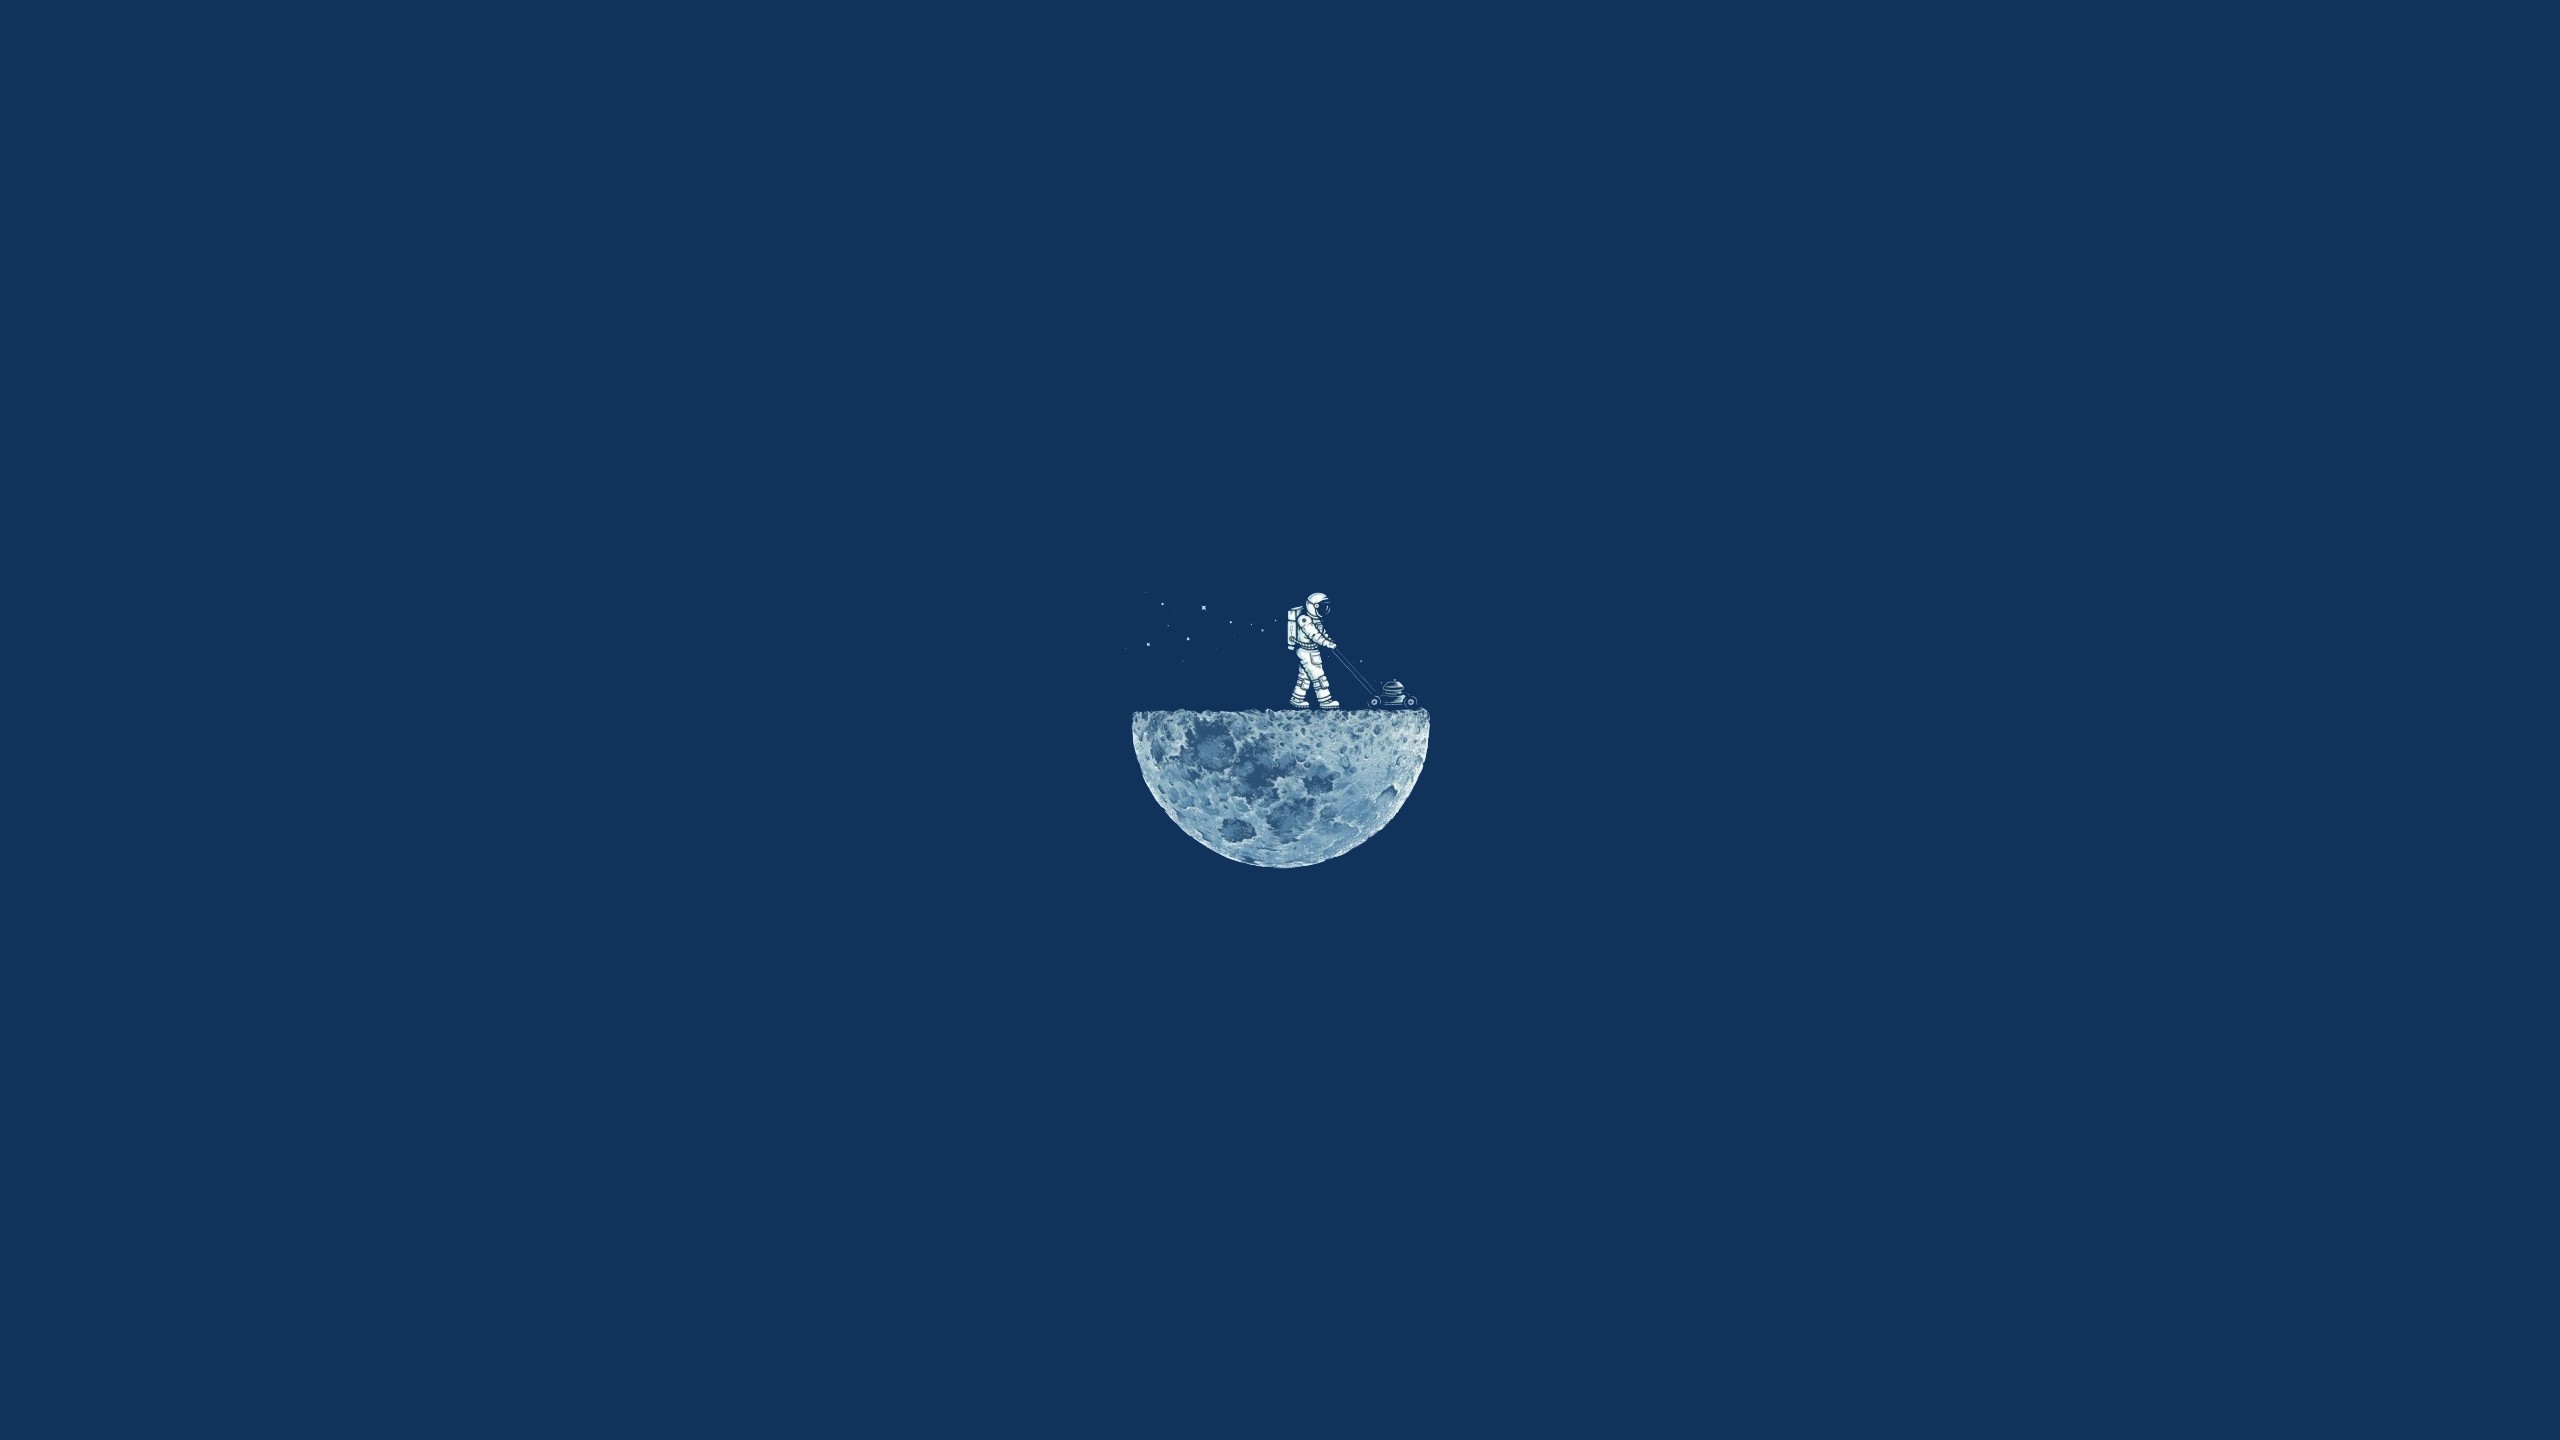 Download Wallpaper Mac Blue - moon-mow-2560x1440-4k-hd-moon-minimalism-iphone-wallpaper-astronaut-13442  Snapshot_239971.jpg